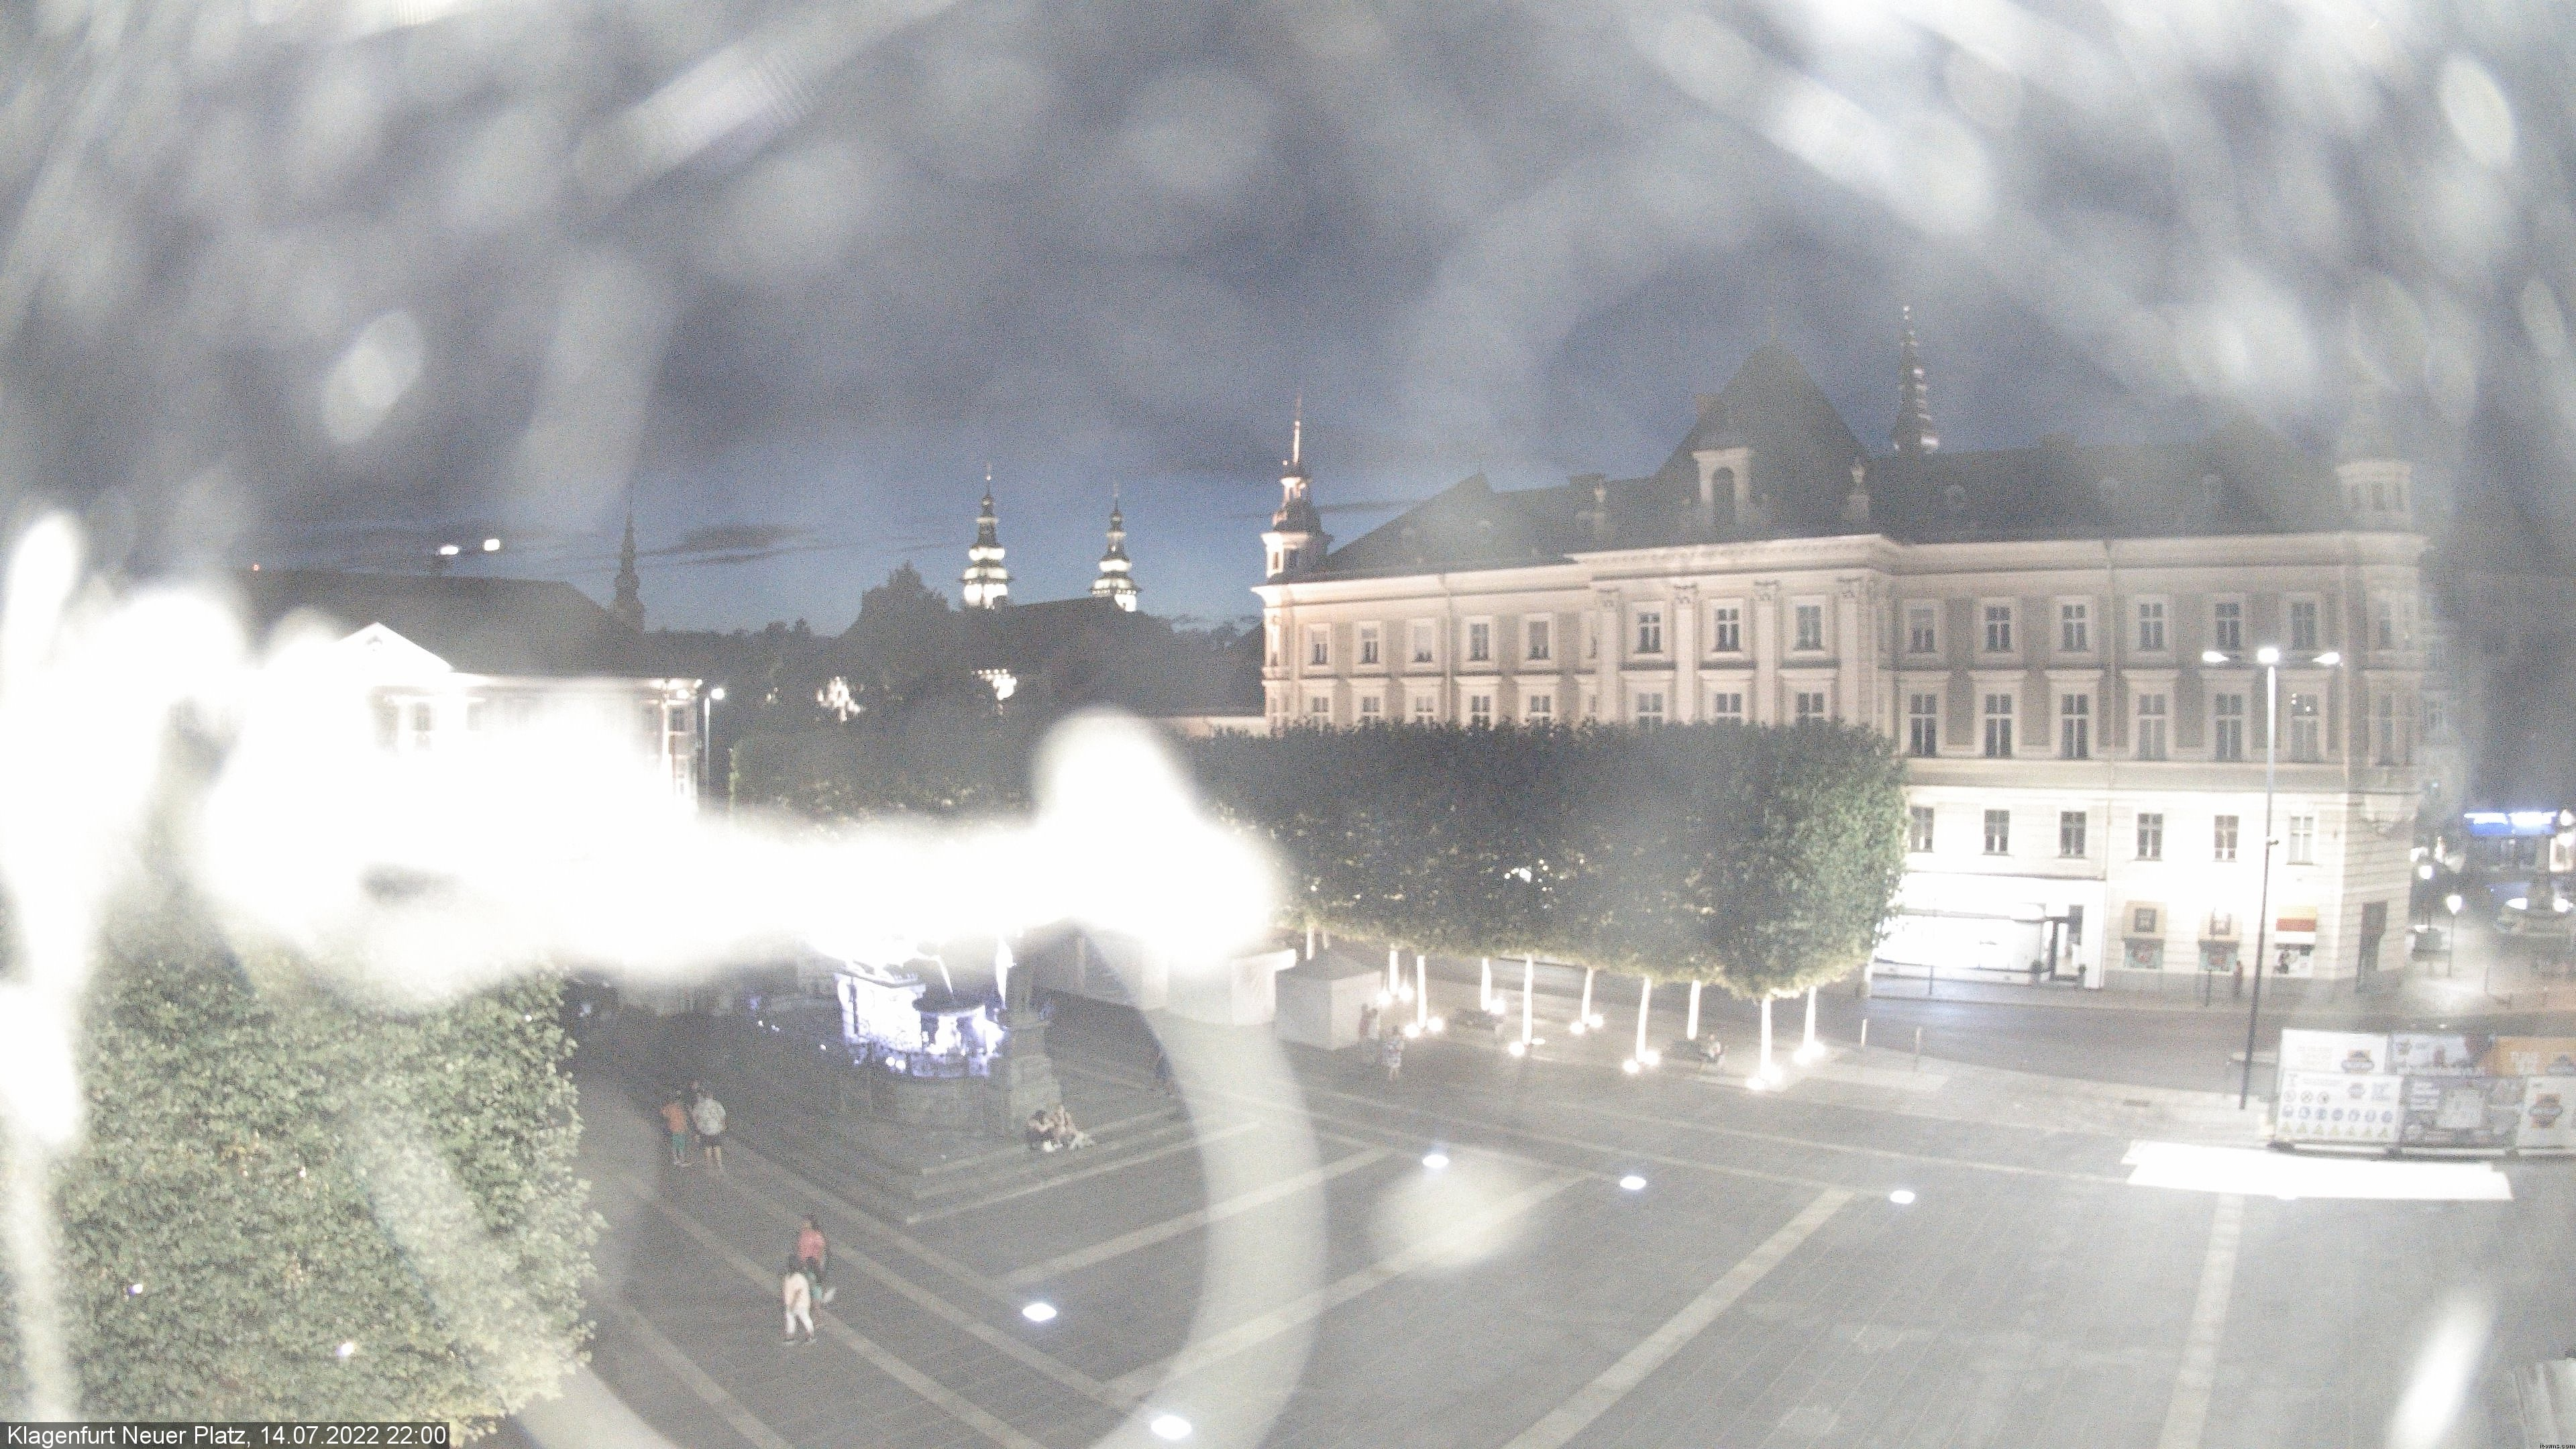 WEBkamera Klagenfurt - Neuen Platz